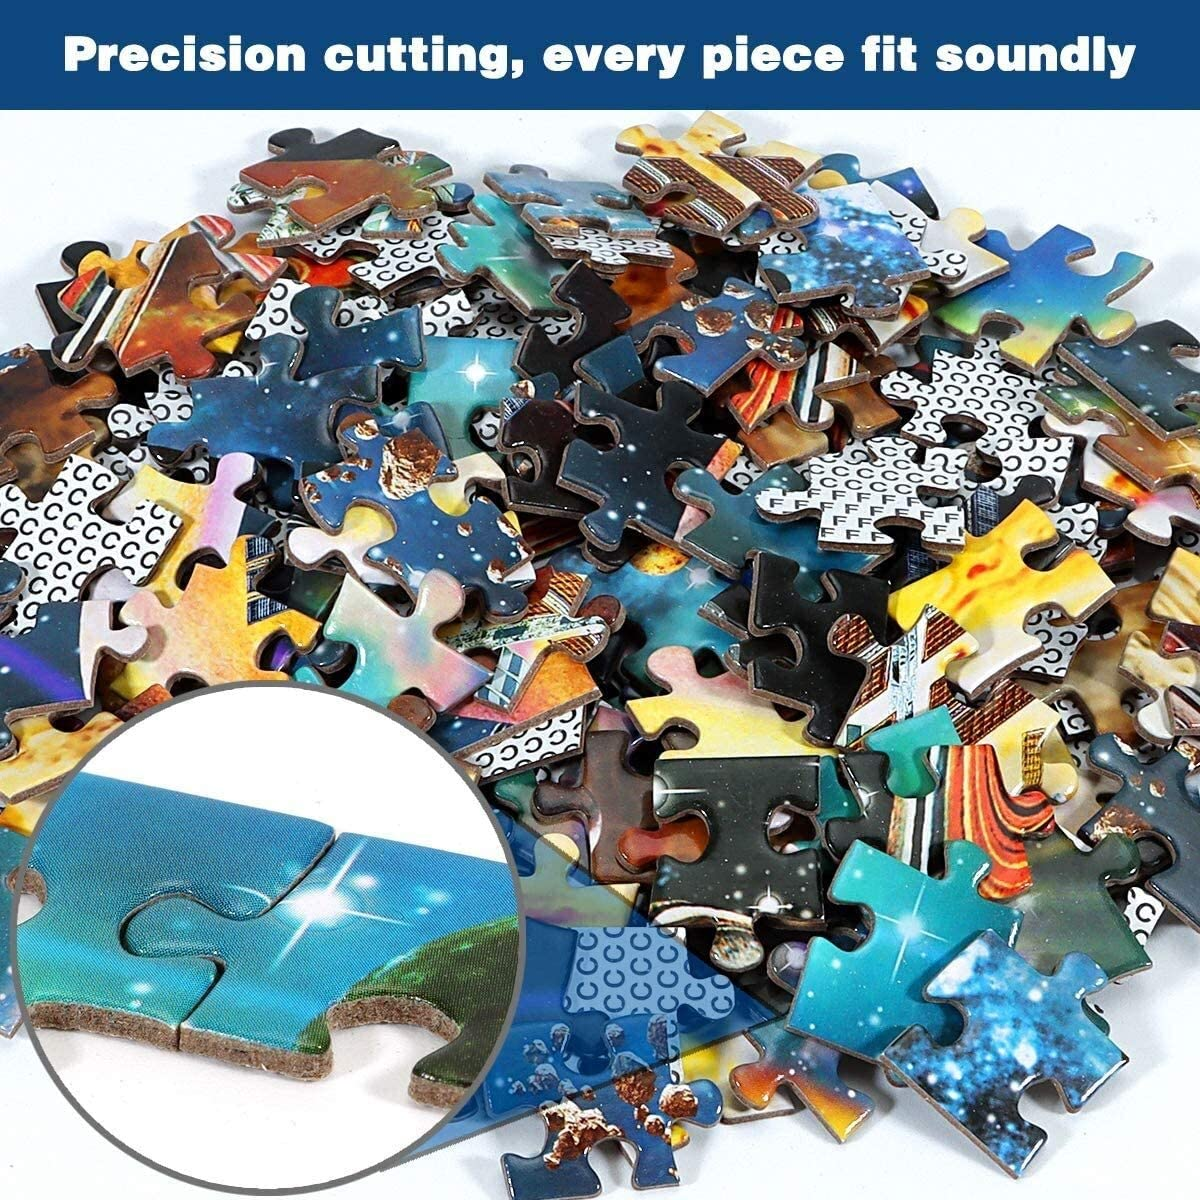 LIUNA Legpuzzels Legpuzzels Volwassenen Puzzels Houten Puzzels Poker Spelende Honden DIY Moderne Decor Van Het Huis 1000 Stuks (Color : 9T) T11